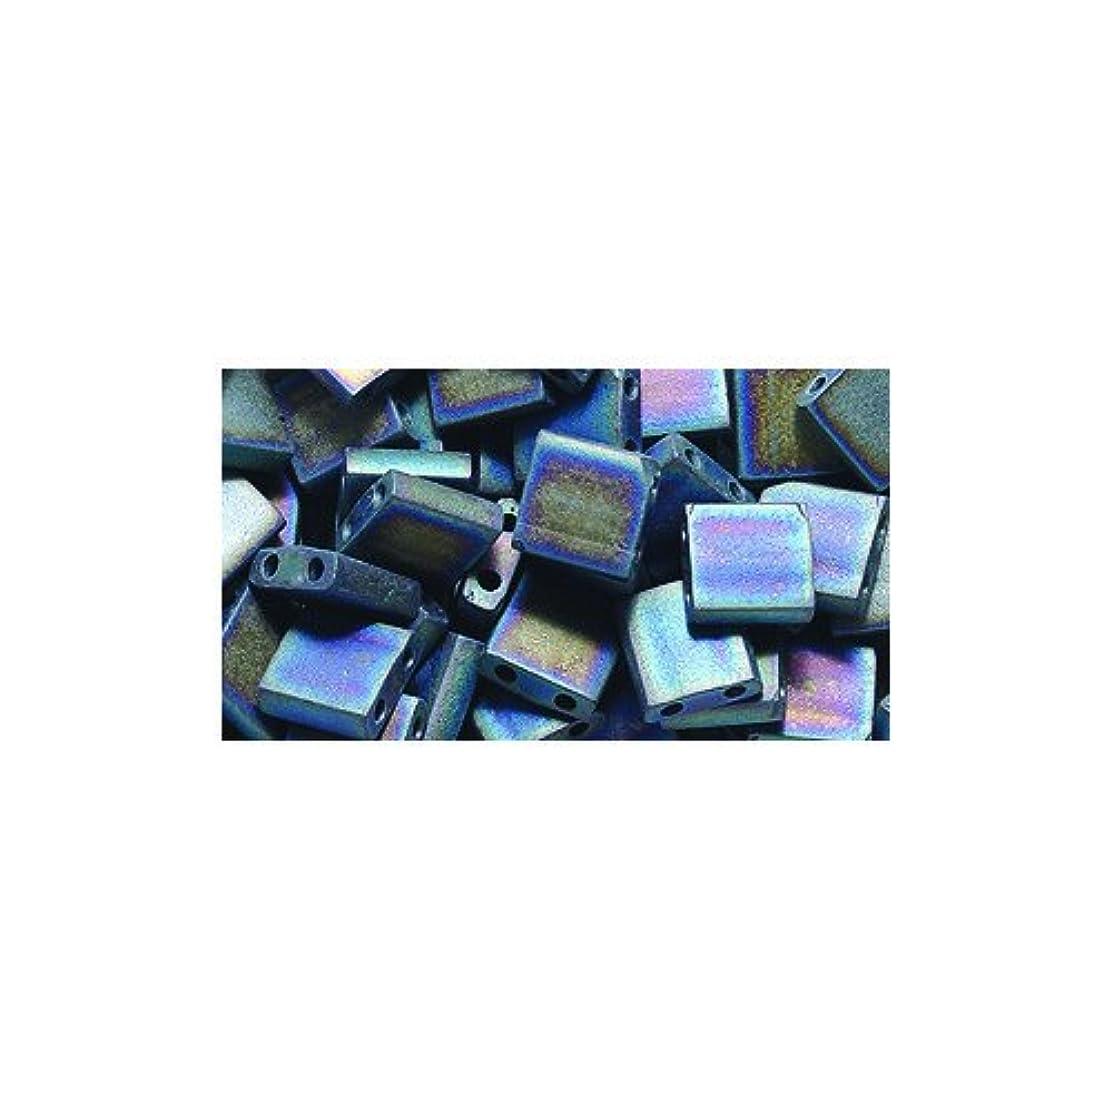 Shipwreck Beads Miyuki Tila Square Two Hole Bead, 5mm, Black Matte Aurora Borealis Finish